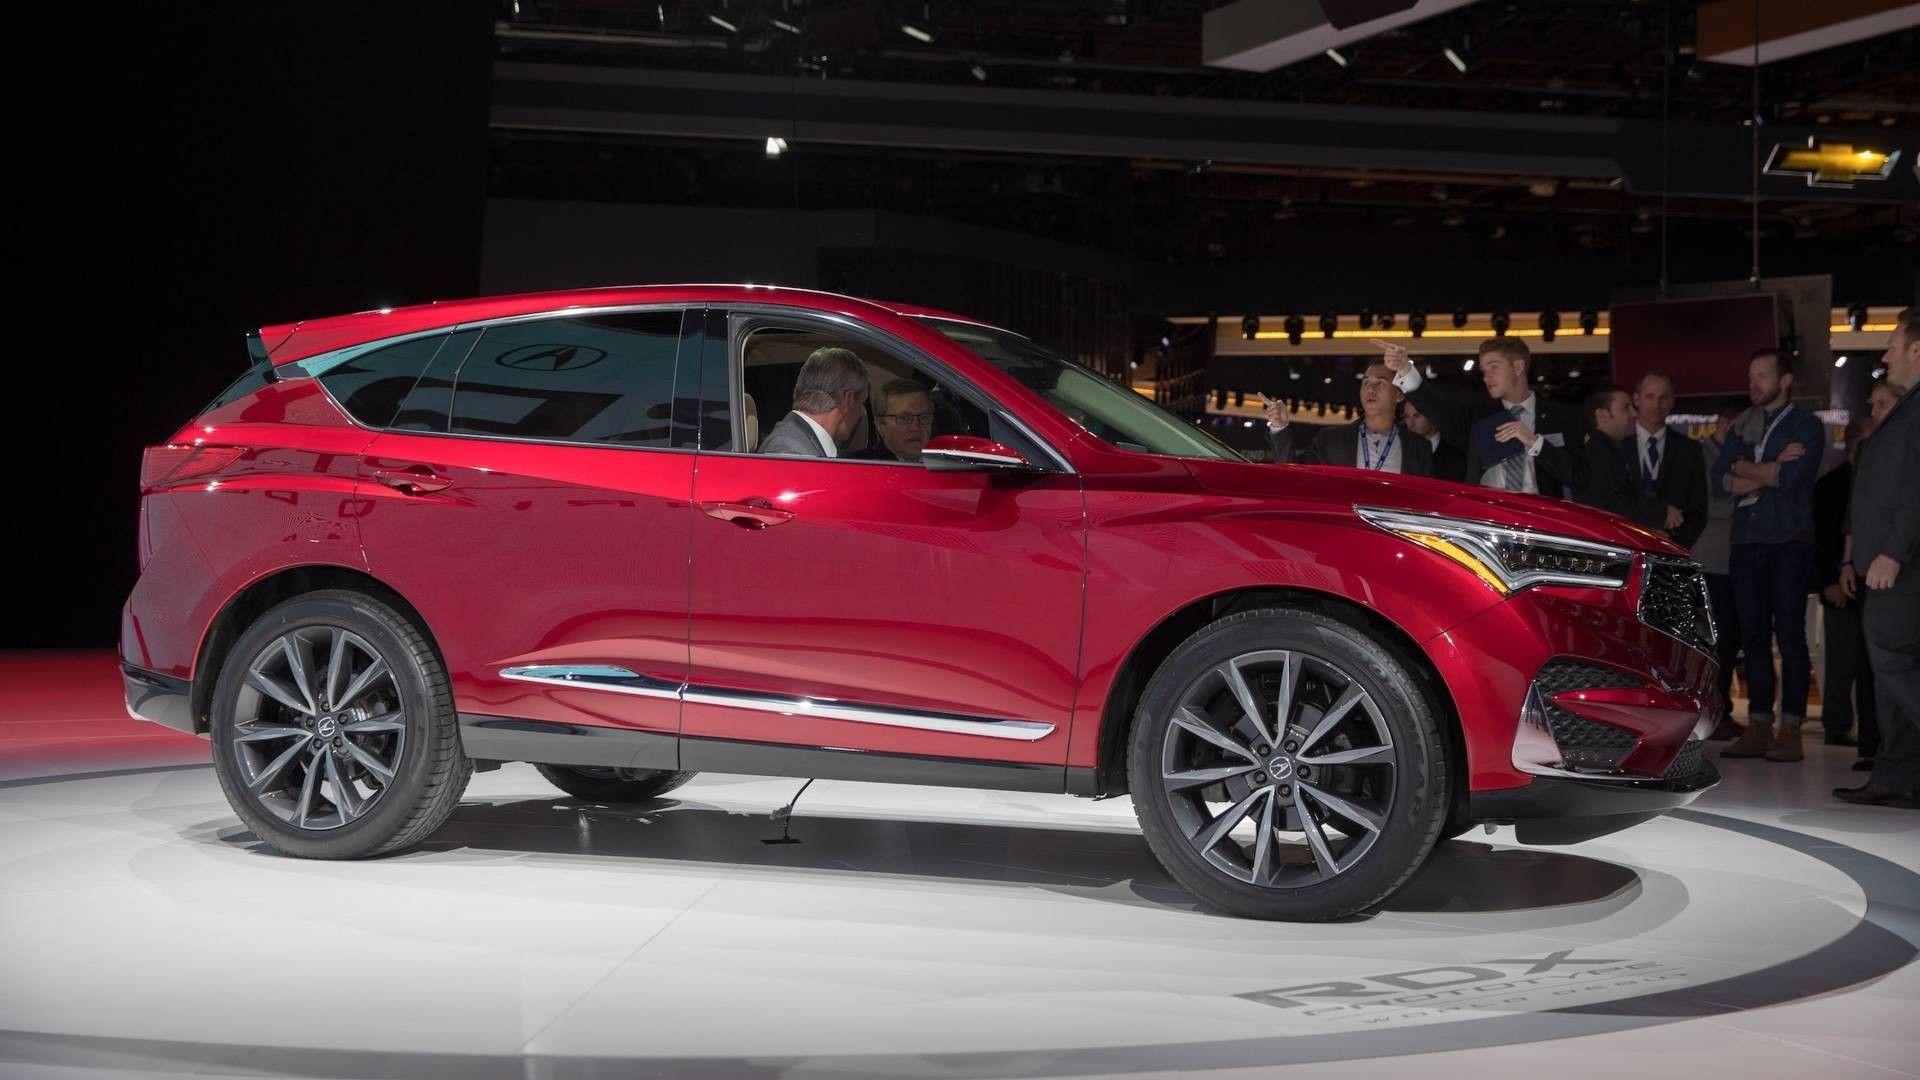 Acura 2019 Rdx Interior Exterior And Review Acura Rdx Acura Acura Mdx